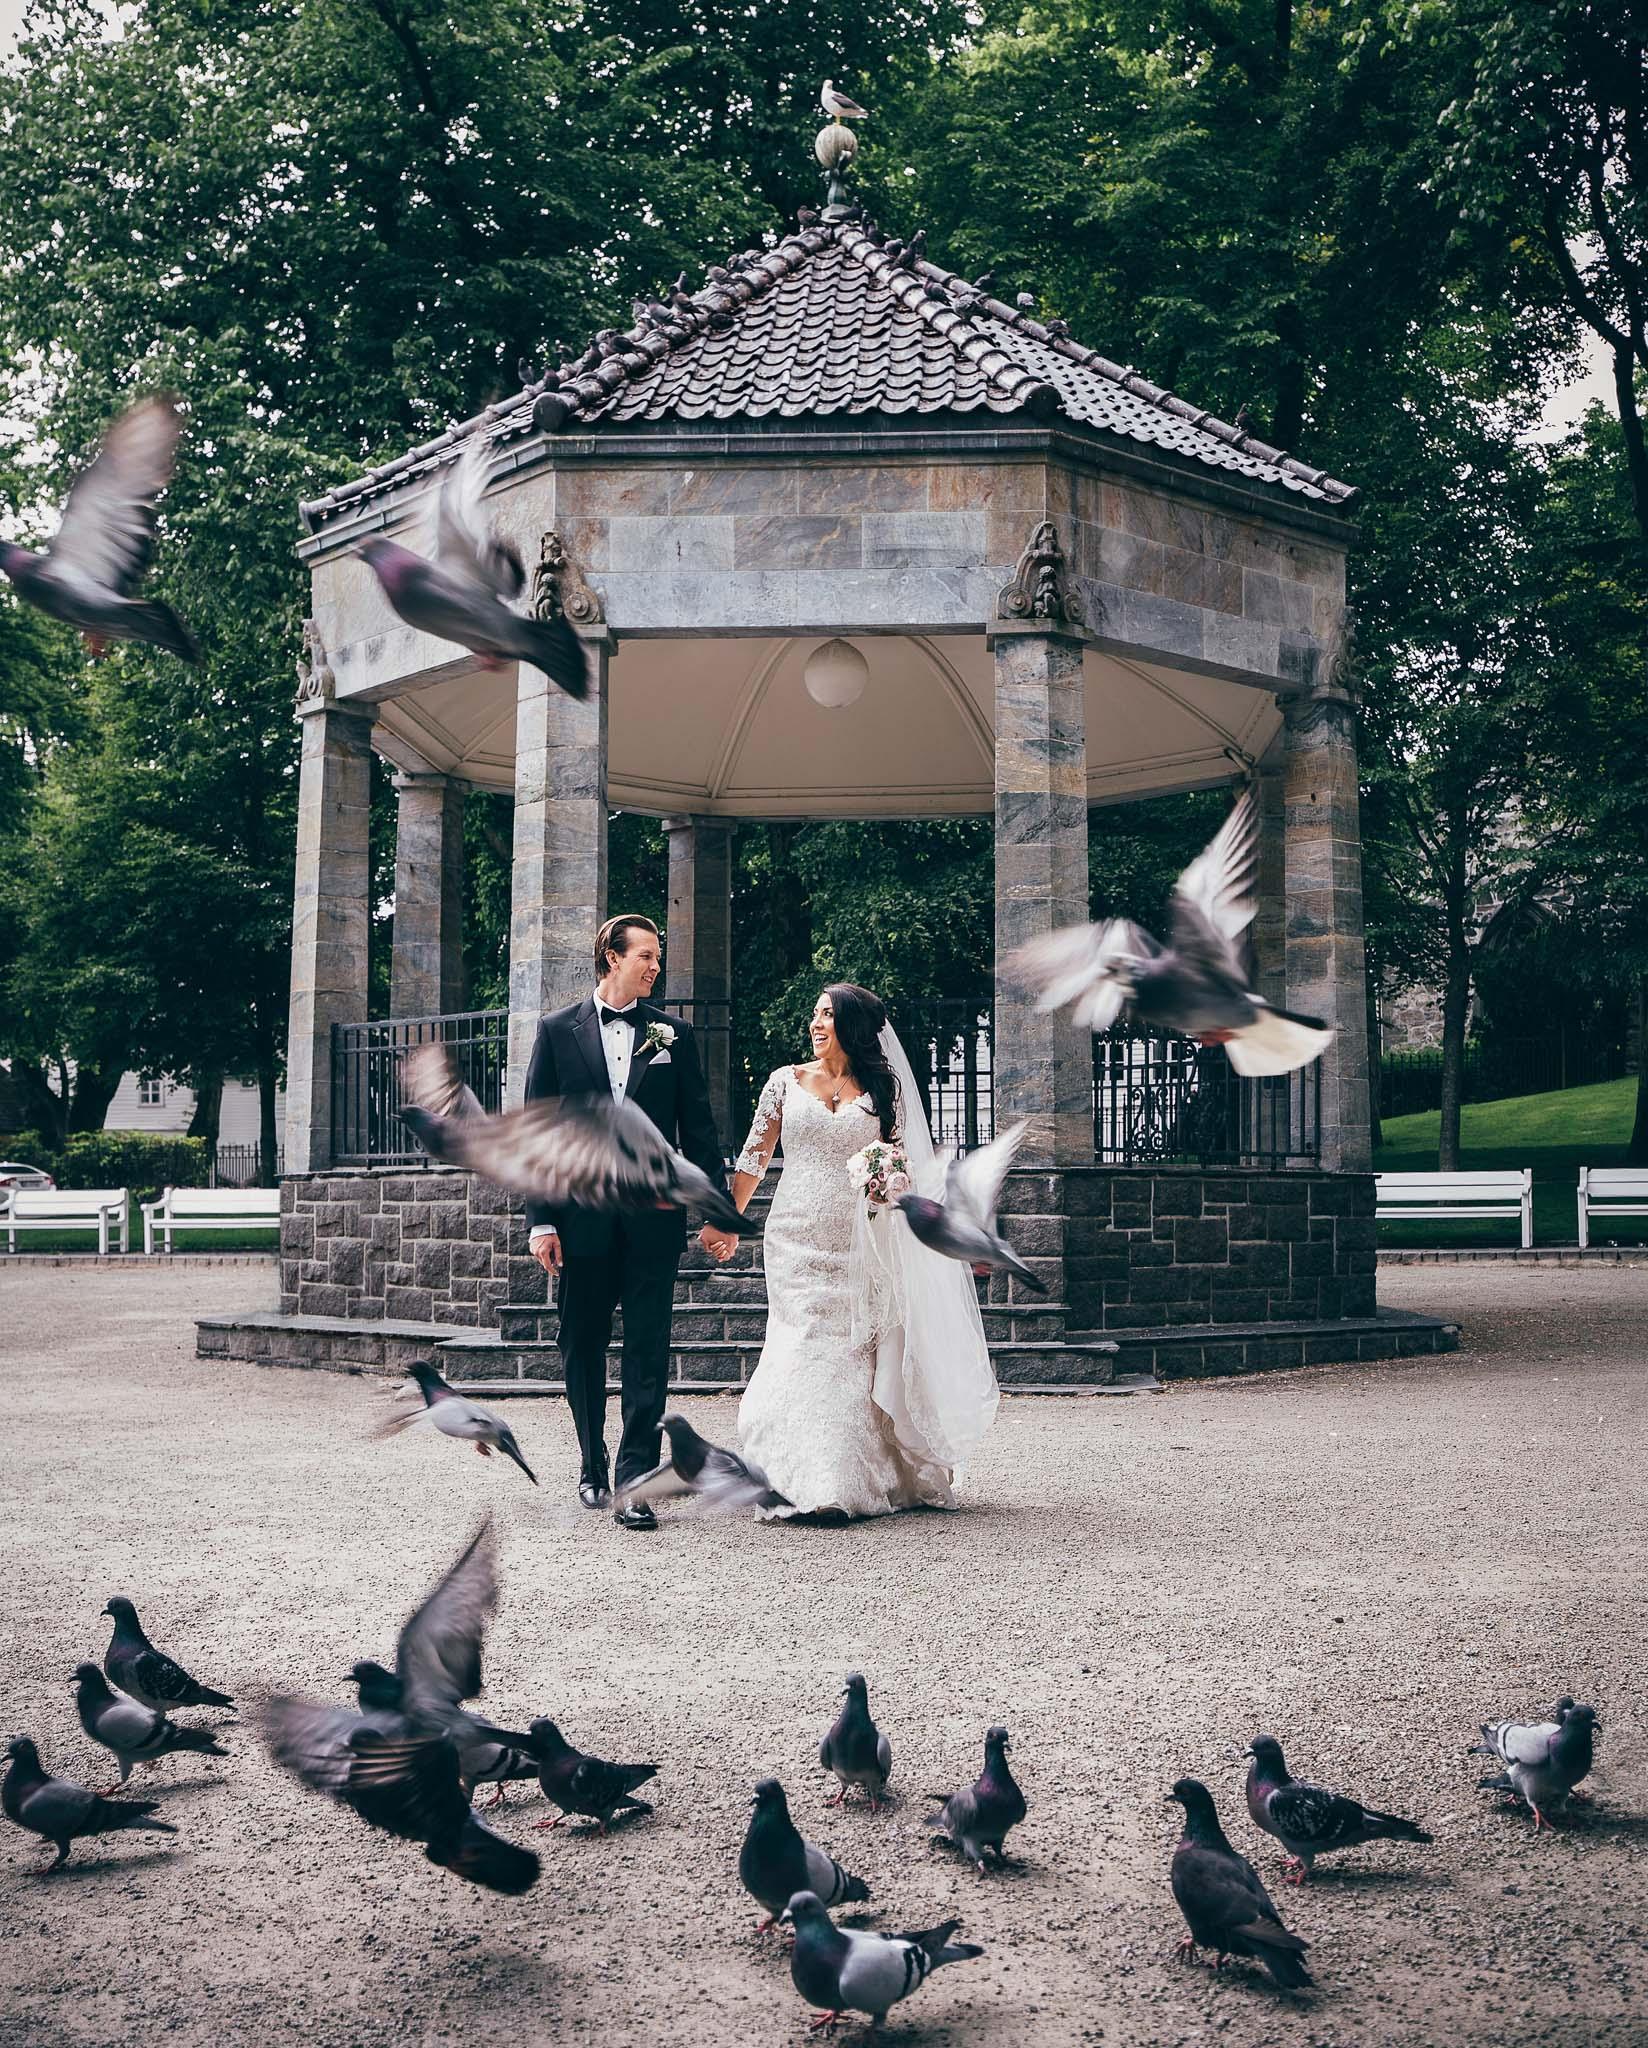 Wedding+Photographer+Norway+Bryllupsfotograf+Casey+Arneson+MK-152.jpg